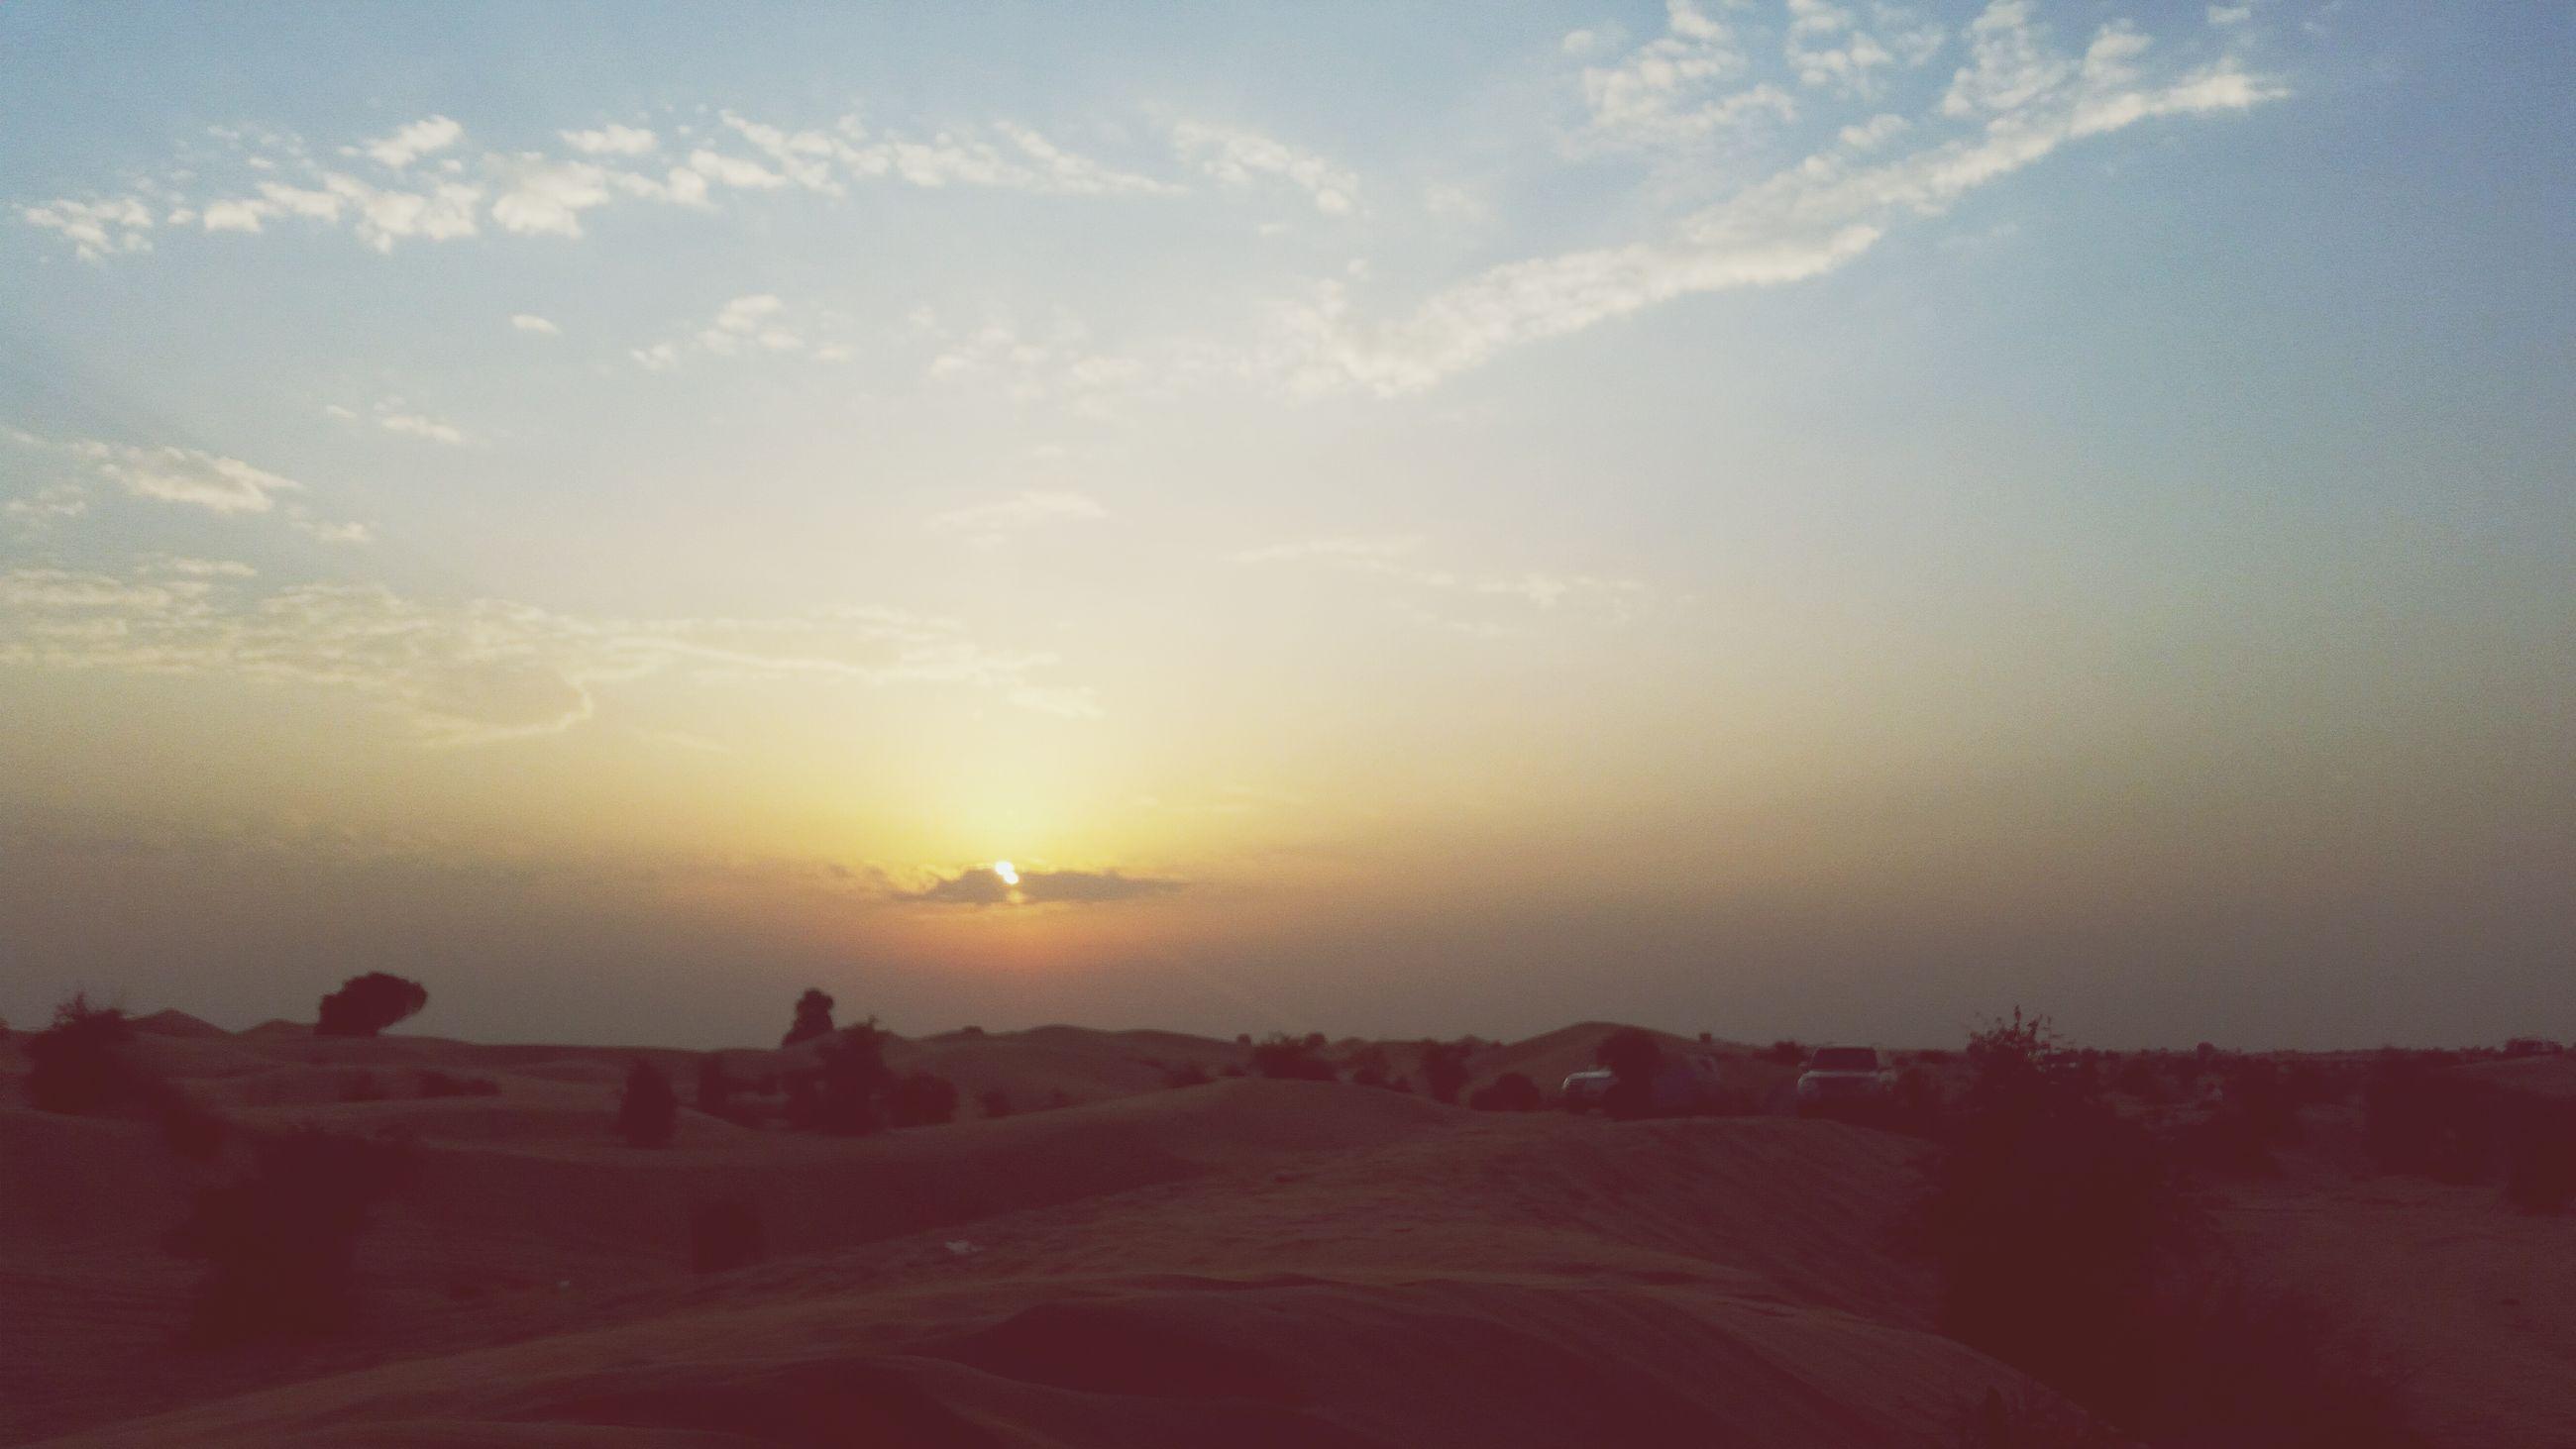 sunset, sky, tranquil scene, sun, landscape, scenics, tranquility, beauty in nature, sunlight, nature, cloud - sky, sunbeam, idyllic, horizon over land, non-urban scene, remote, lens flare, cloud, outdoors